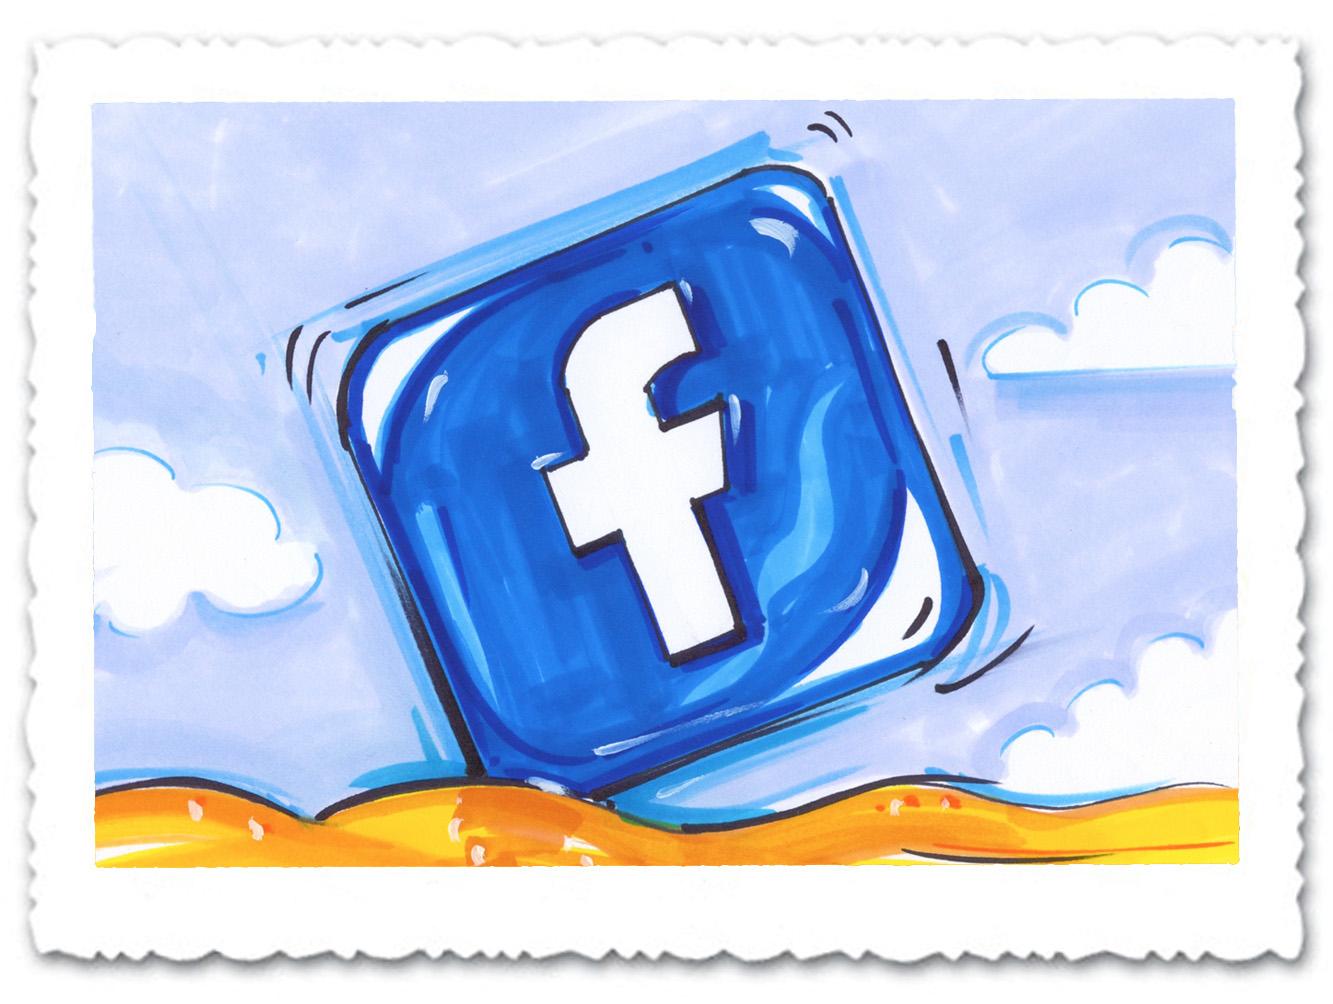 Like Beach Design on Facebook